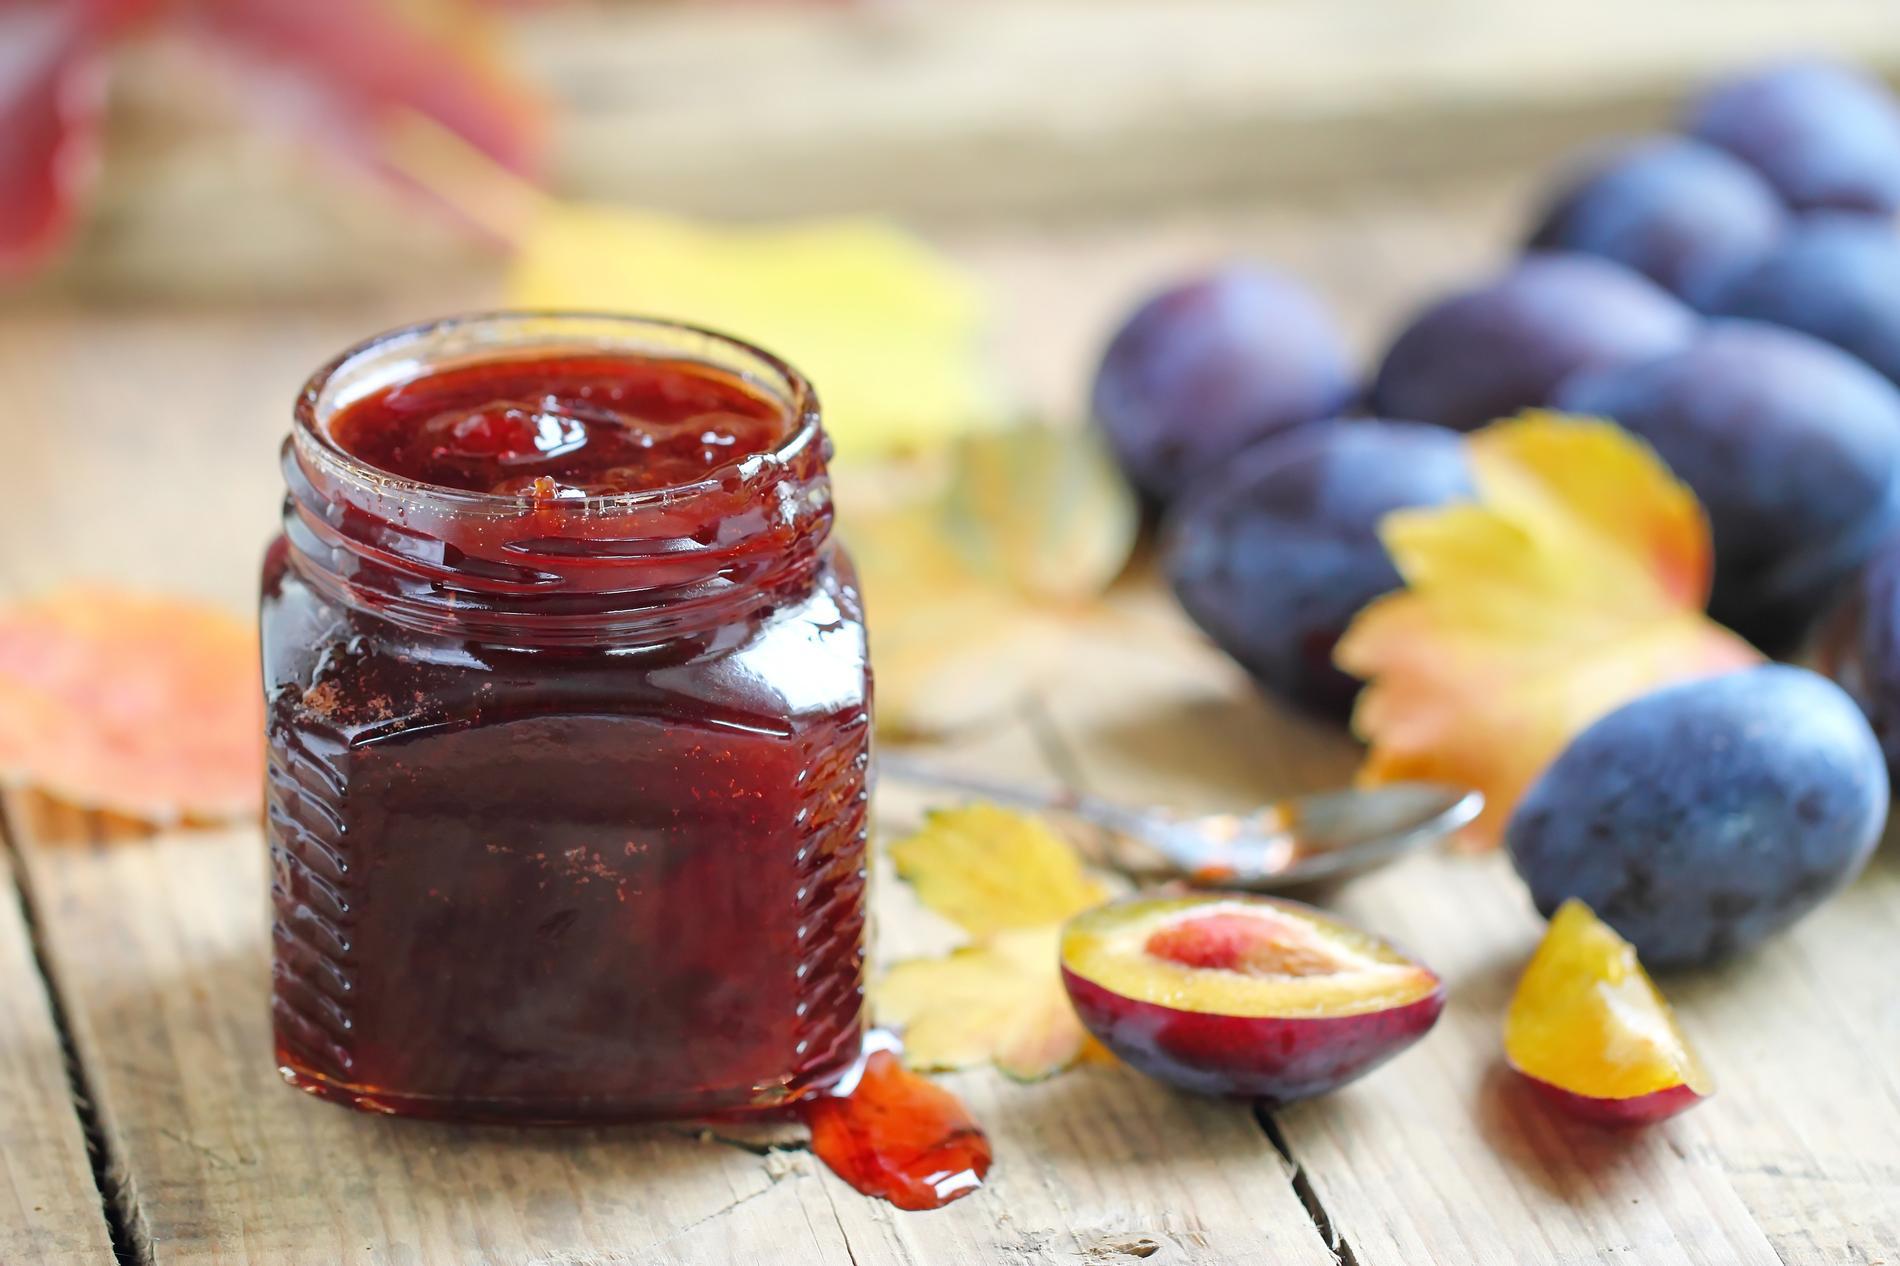 Recette : Confiture de prunes